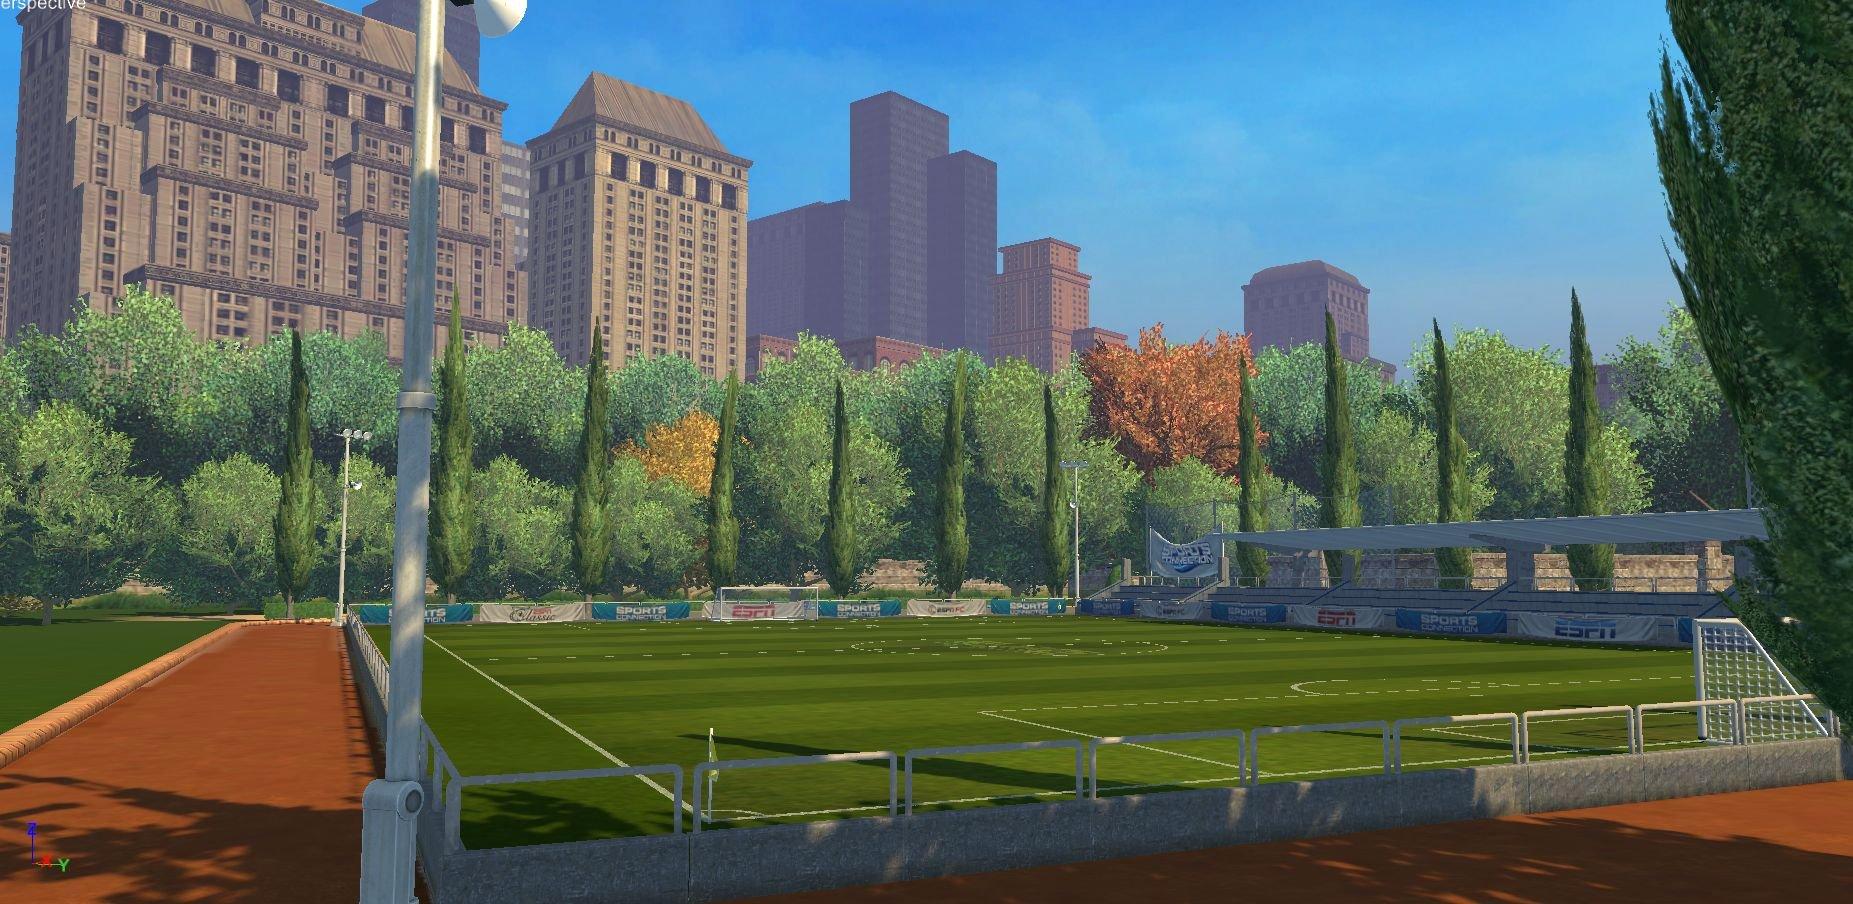 Pere balsach sc soccer 01 01